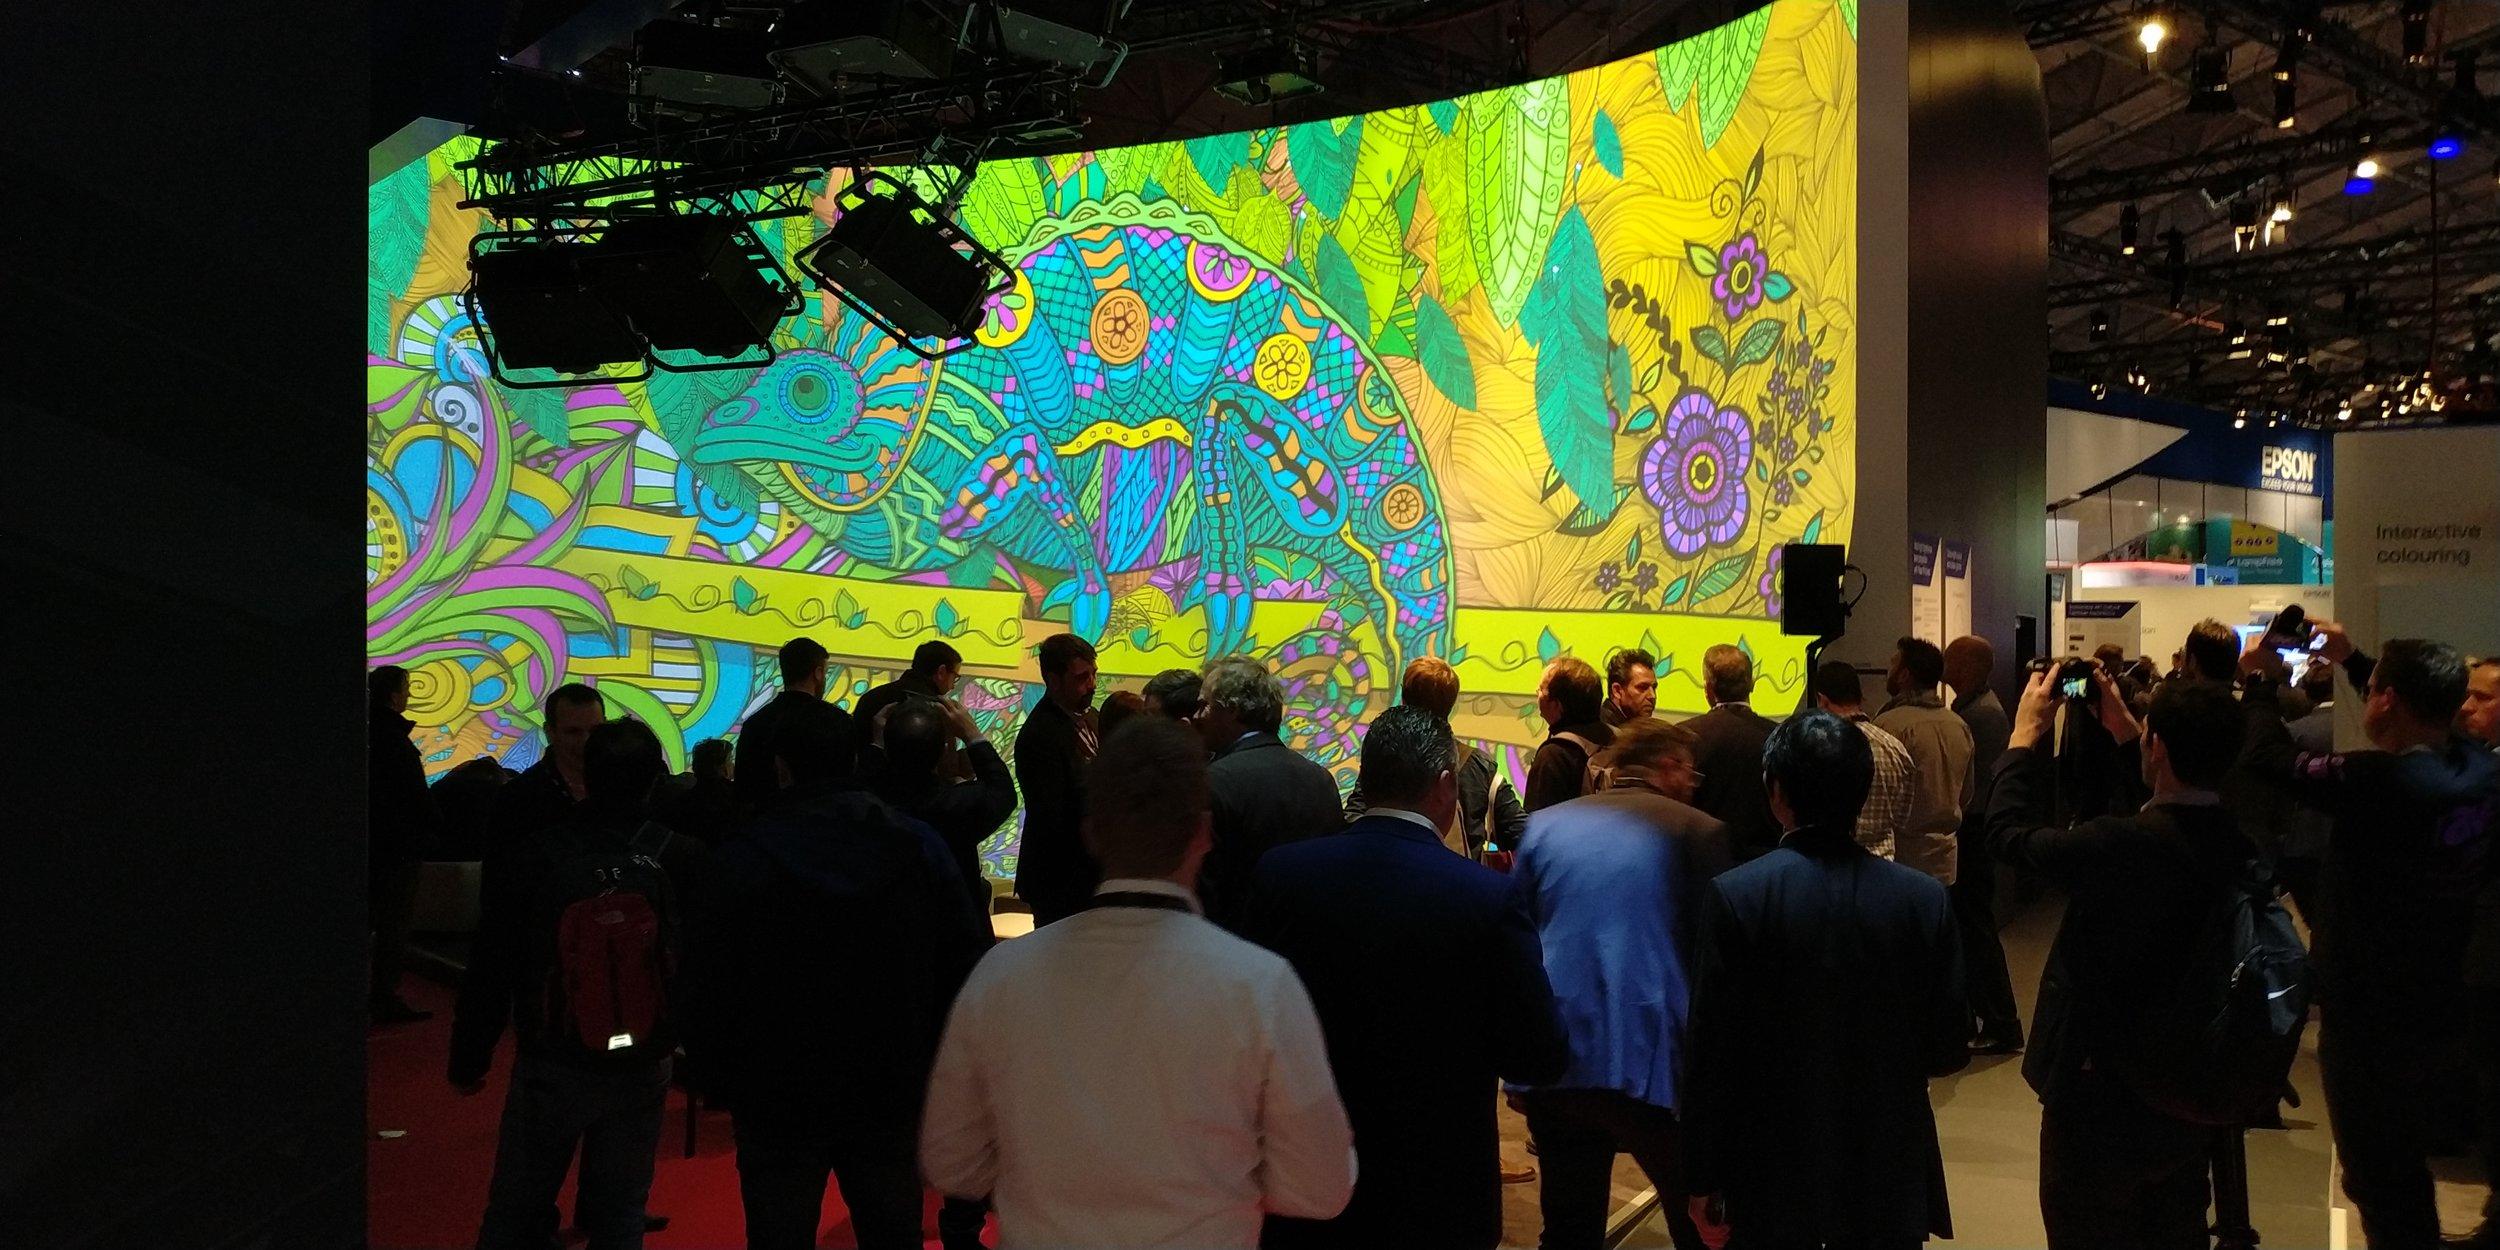 Digital Display - Huge Screen LED